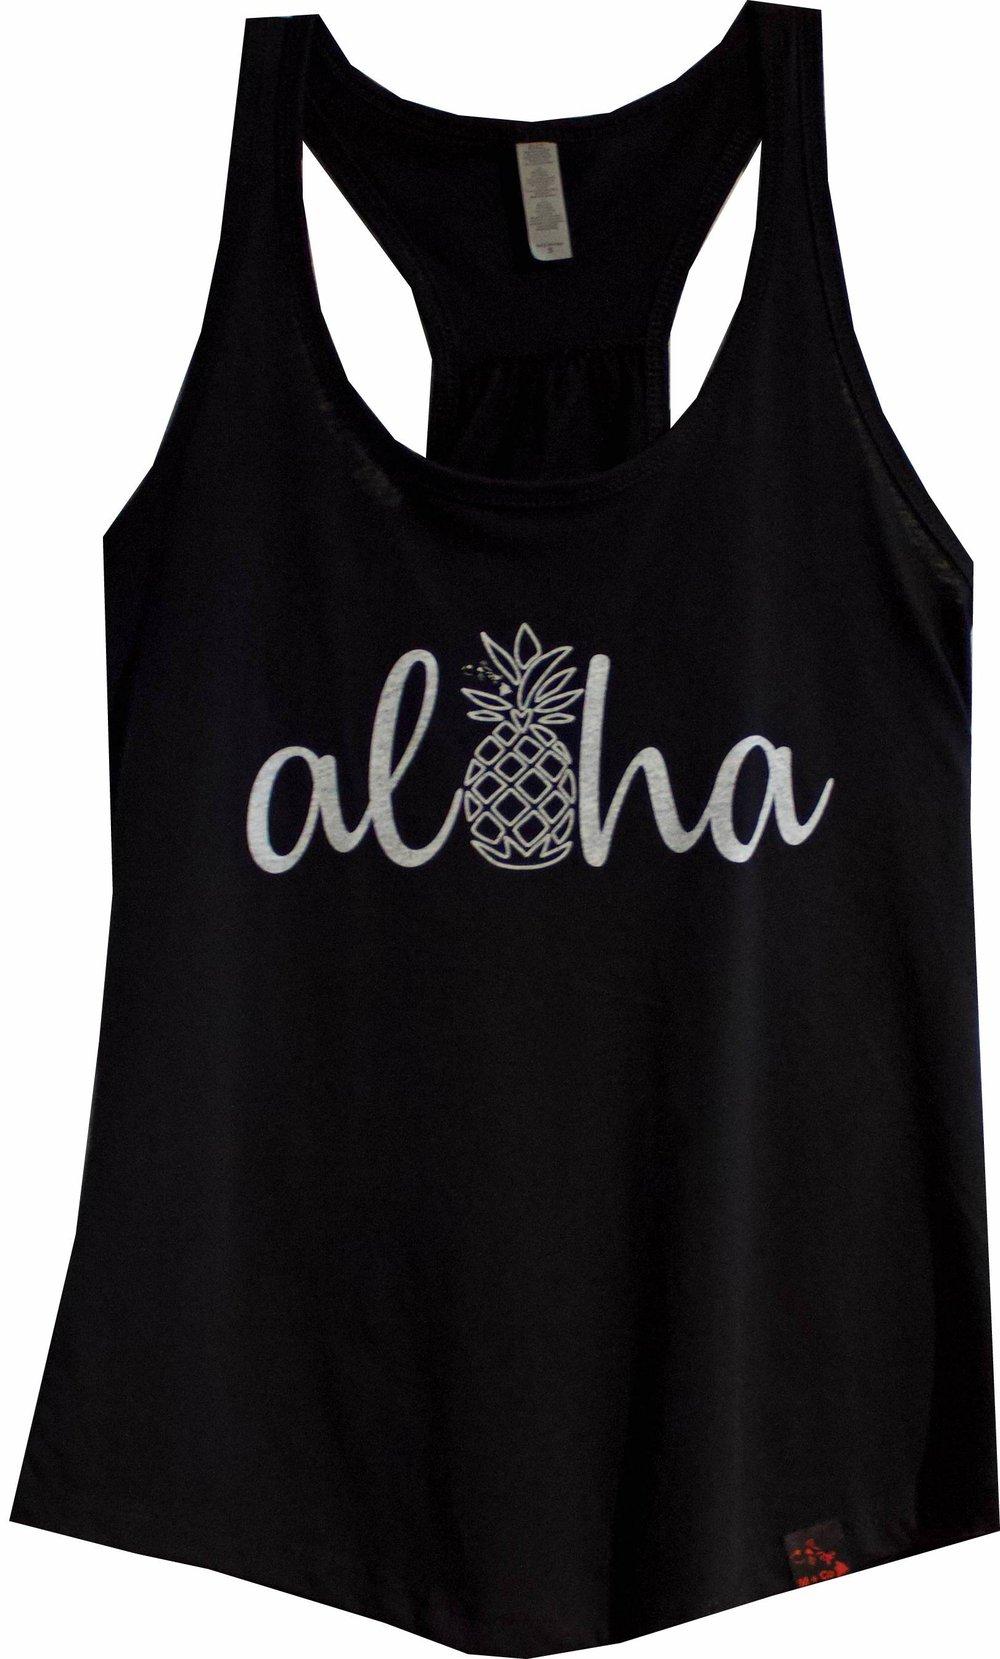 Image of Aloha Pineapple - Black Tank